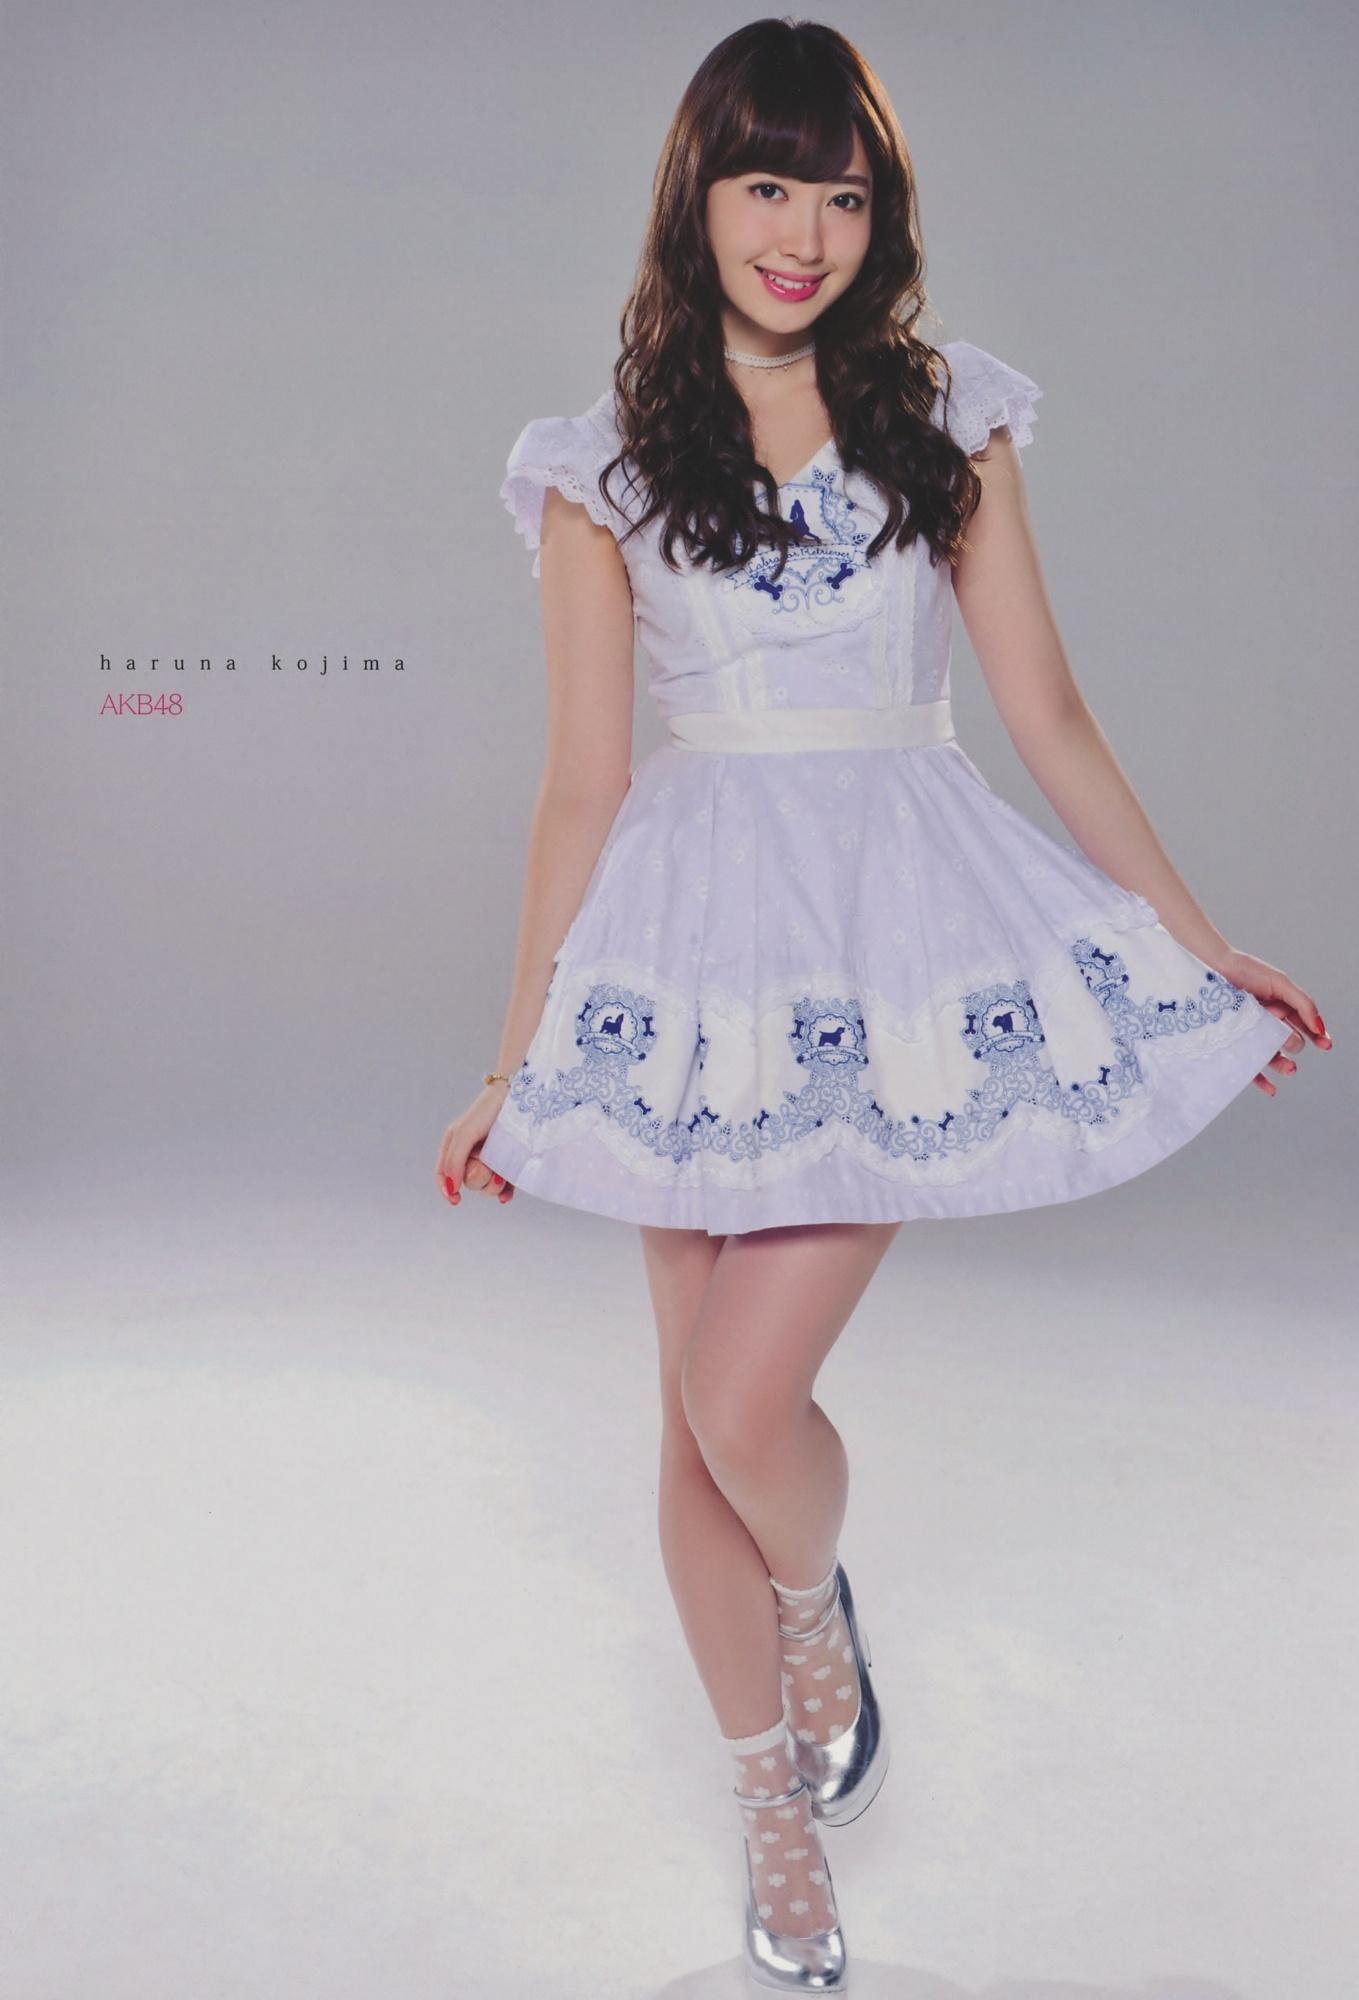 Haruna Kojima - AKB48 | page 9 of 20 - Asiachan KPOP Image ...